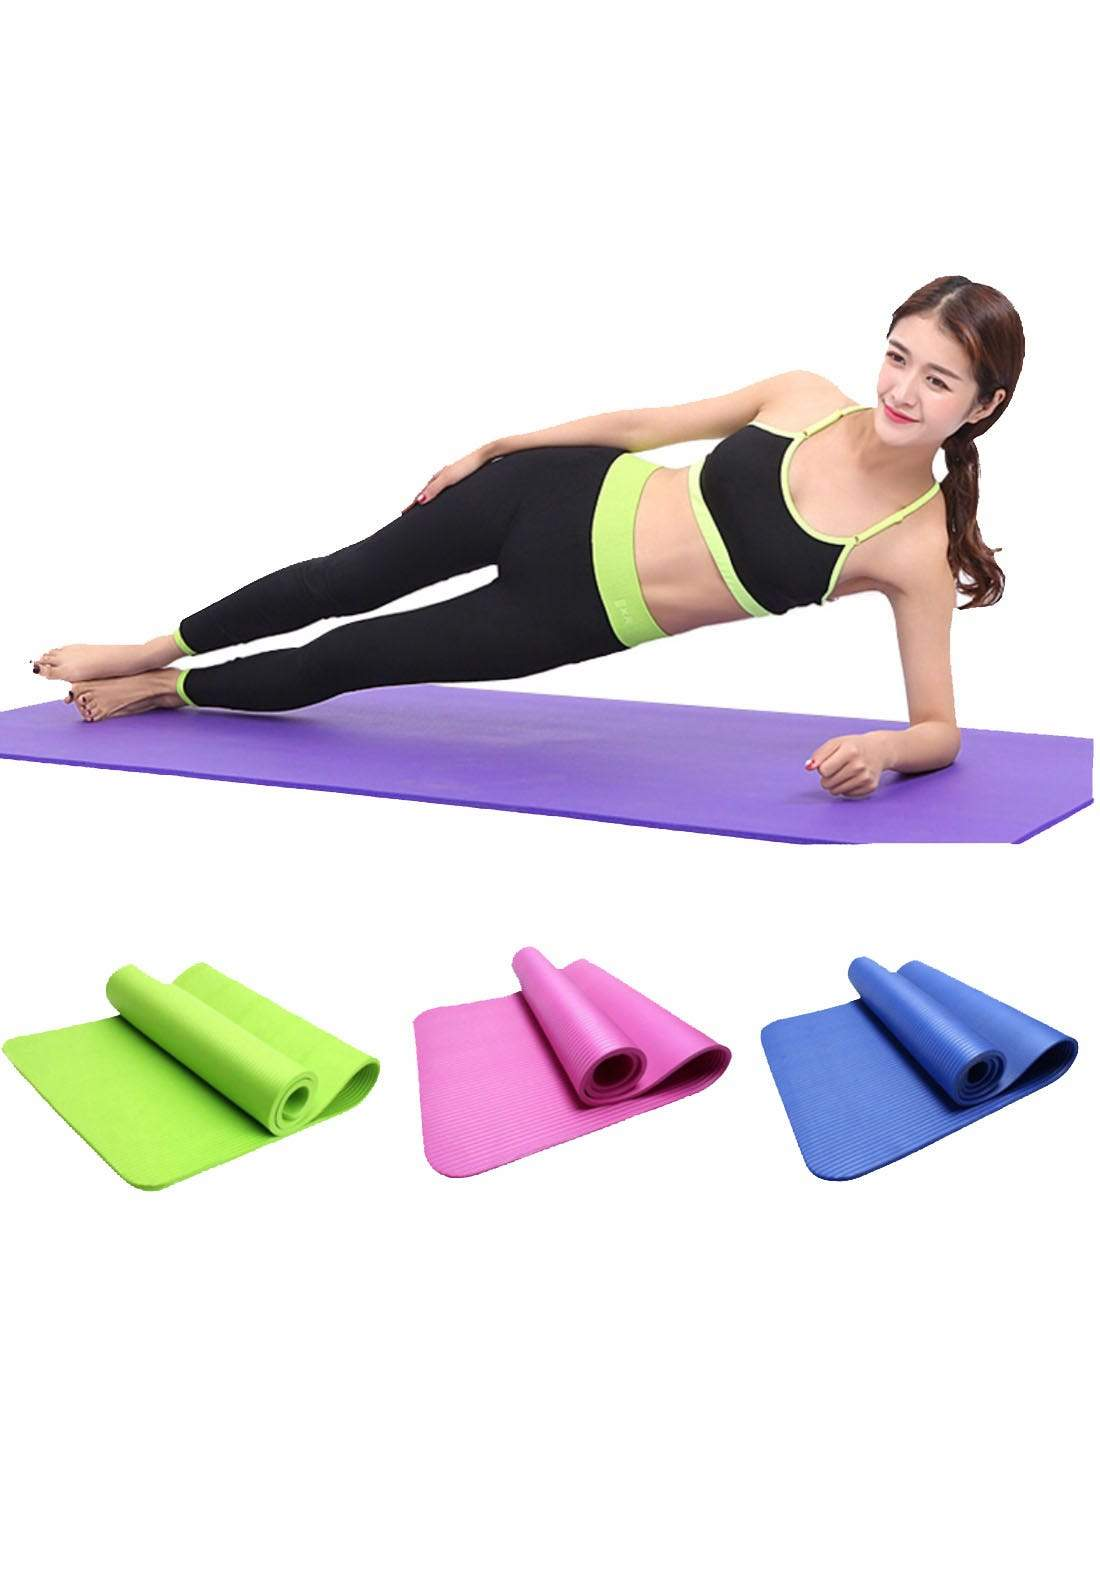 Studio Grade Yoga Mats with Carry Strap بساط يوغا للتمارين الرياضية